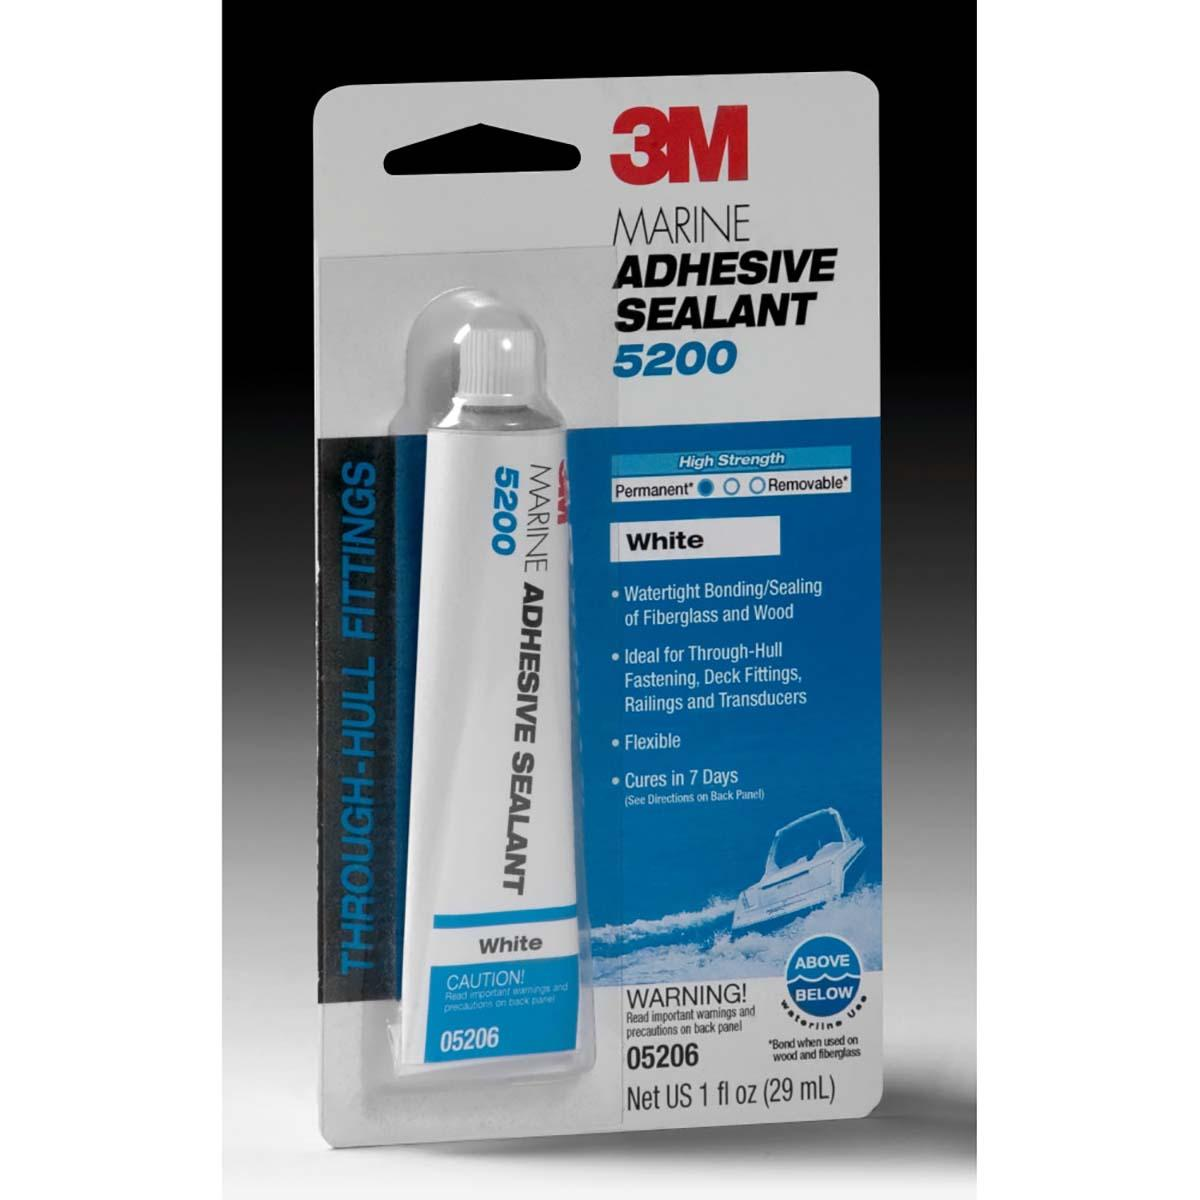 3M Marine Adhesive Sealant 5200 White, PN05206, 1 oz Tube , 12 Tubes per case